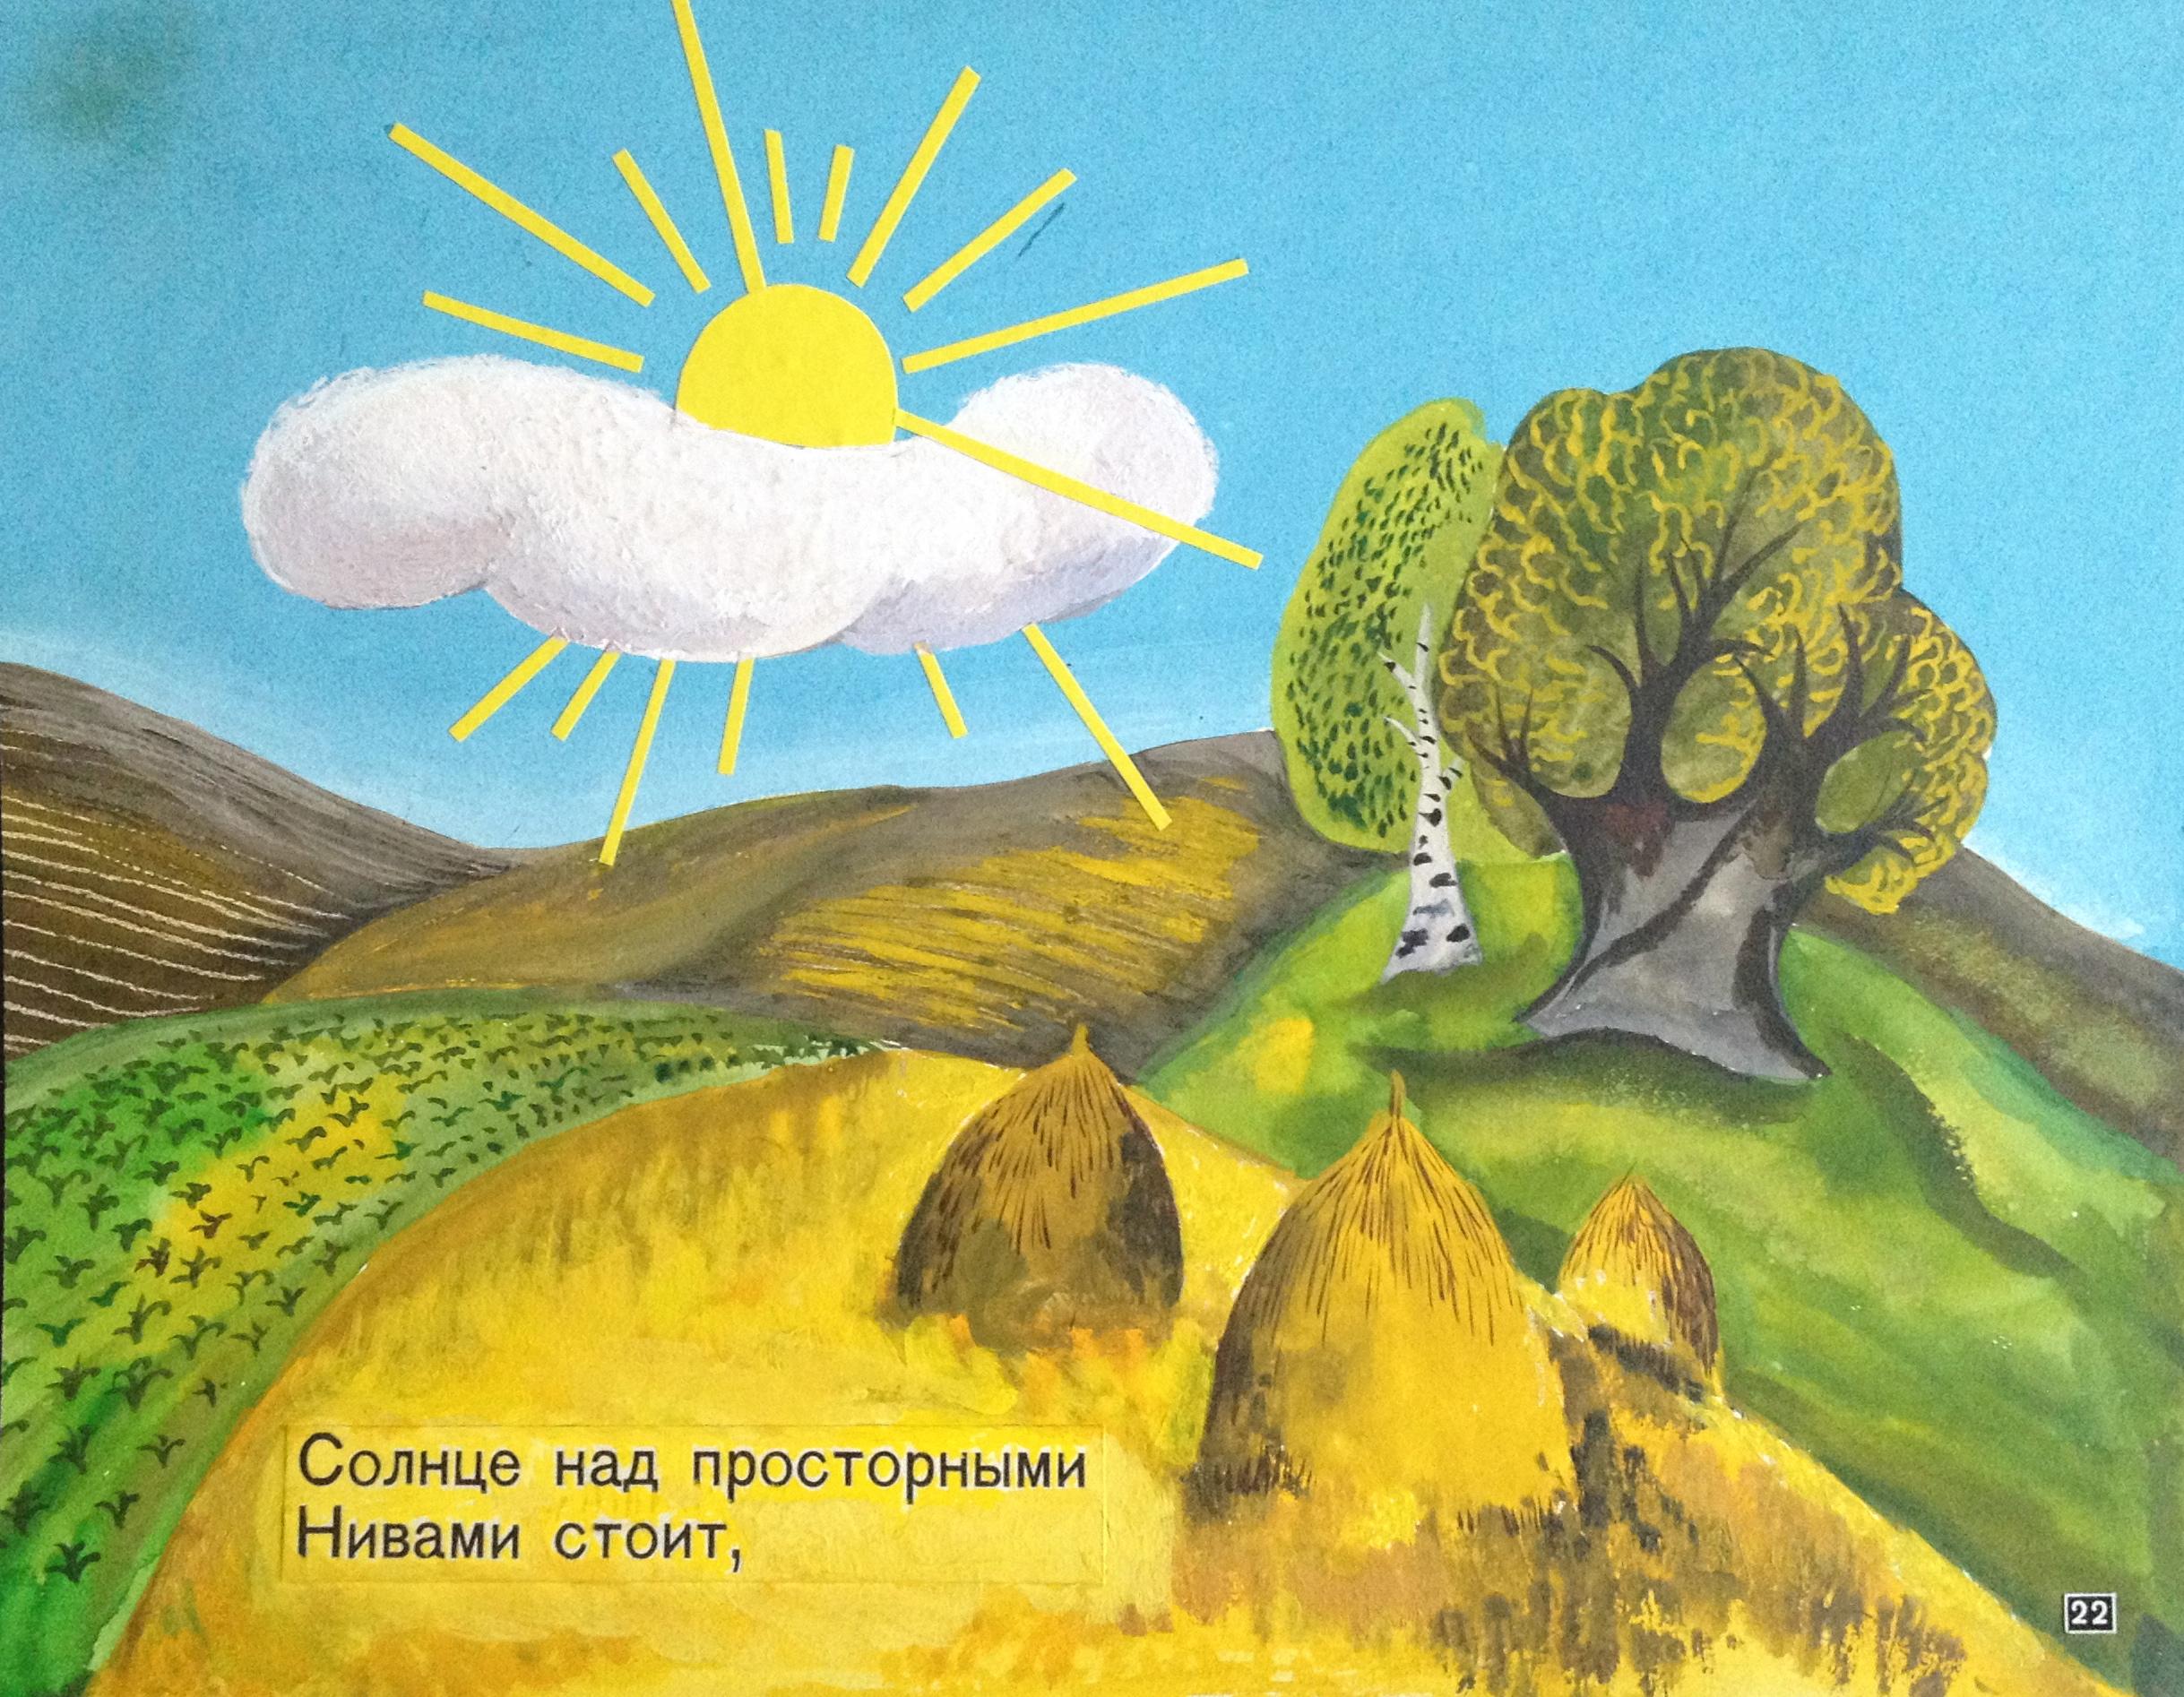 Зеброва Тамара Александровна. Солнце над просторными нивами стоит.